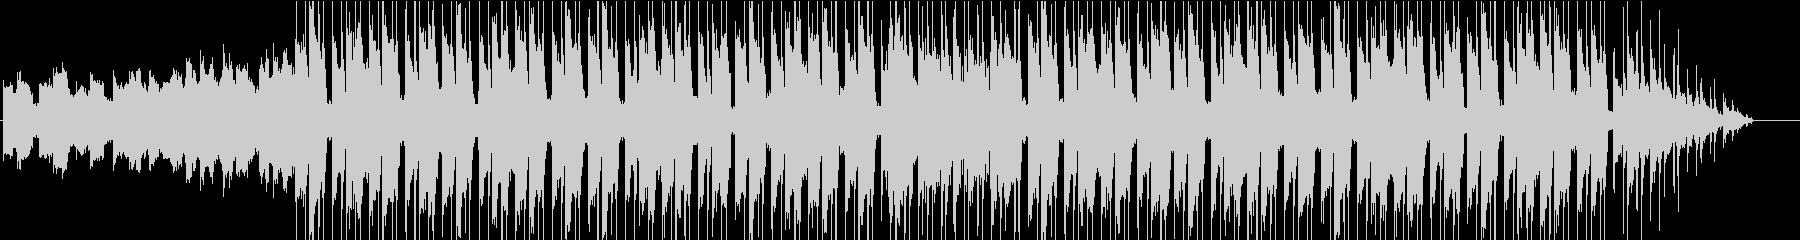 SFっぽいエレクトロニカの未再生の波形